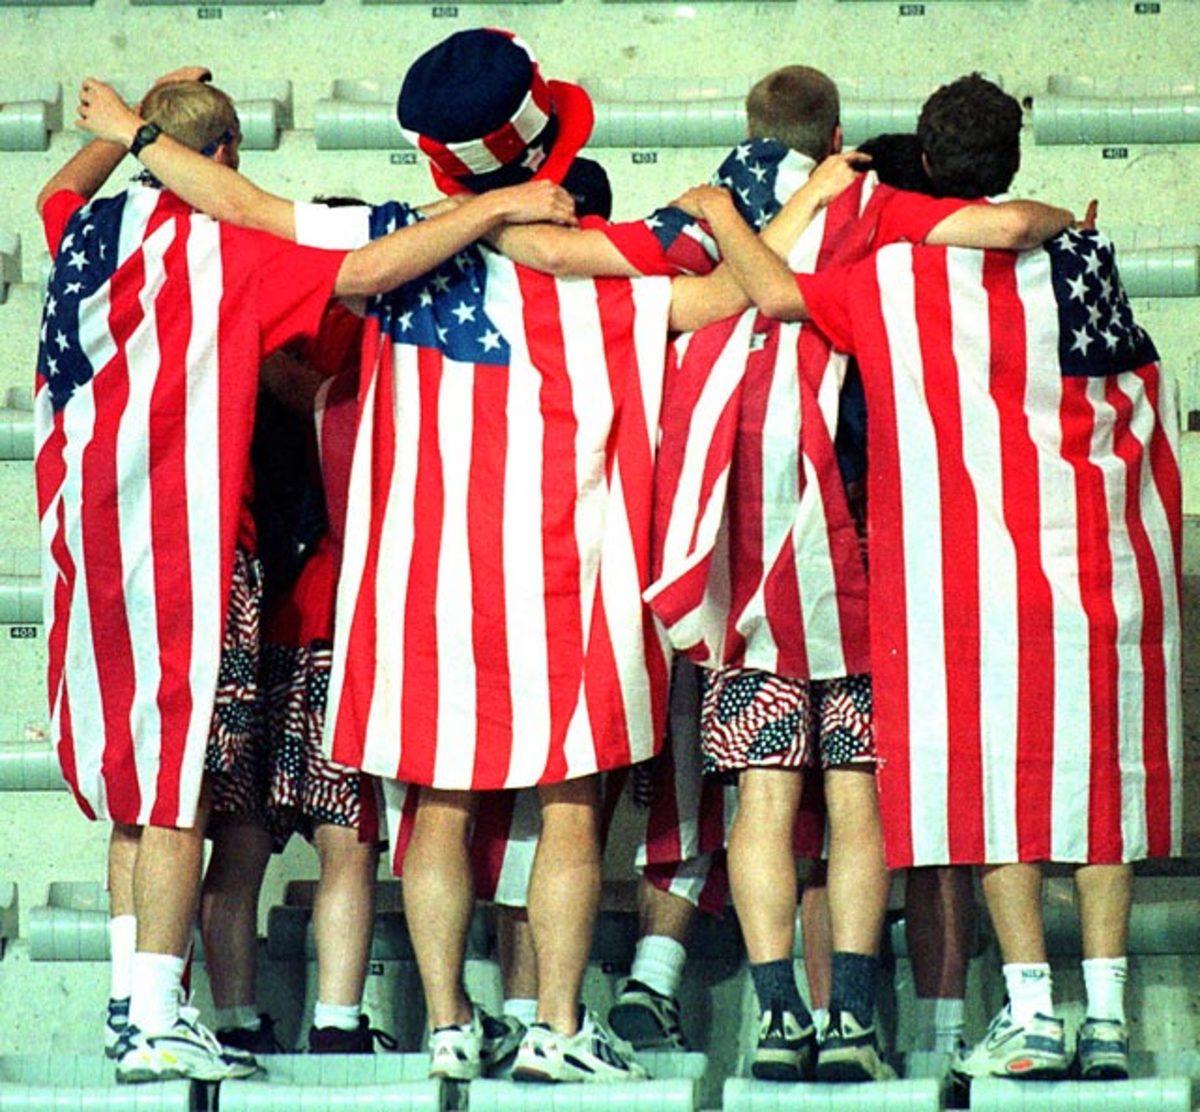 140514094906-1998-worldcup-946a-single-image-cut.jpg